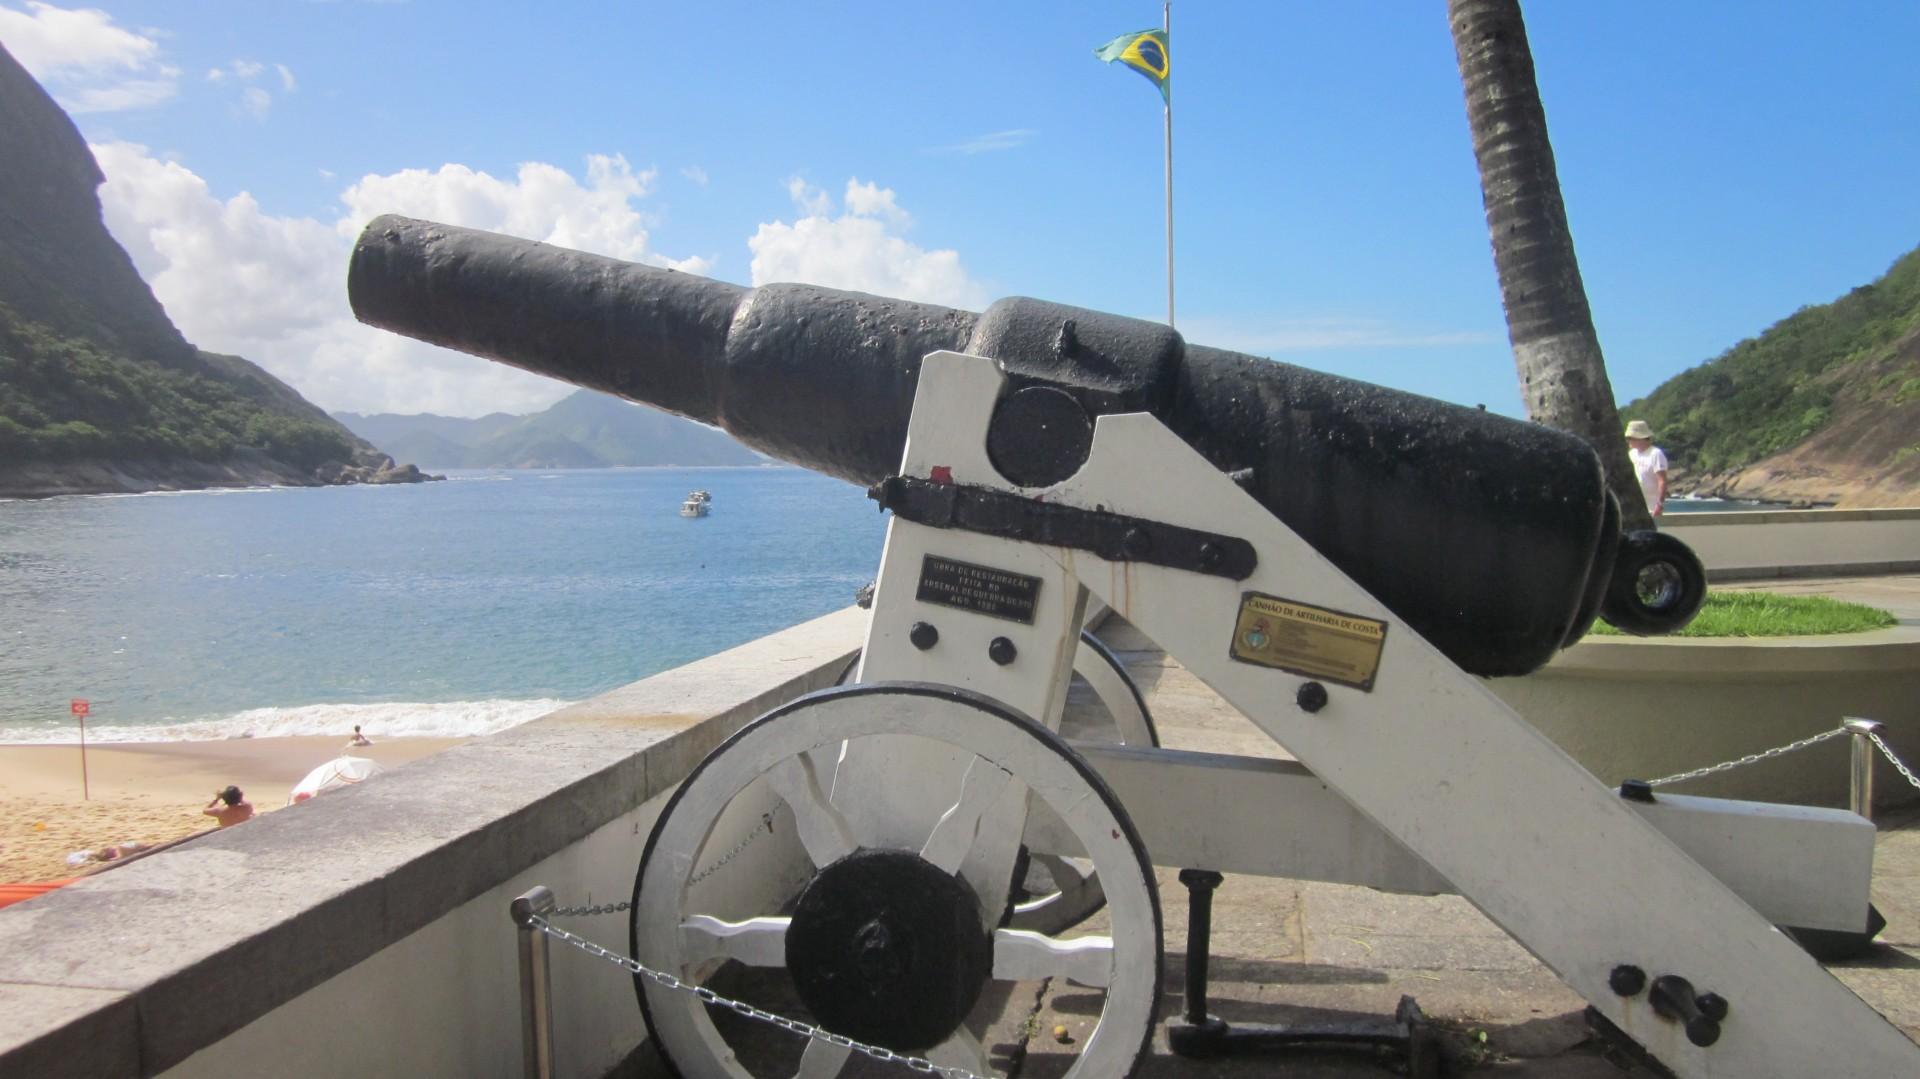 Historic Cannon In Rio Free Stock Photo - Public Domain Pictures